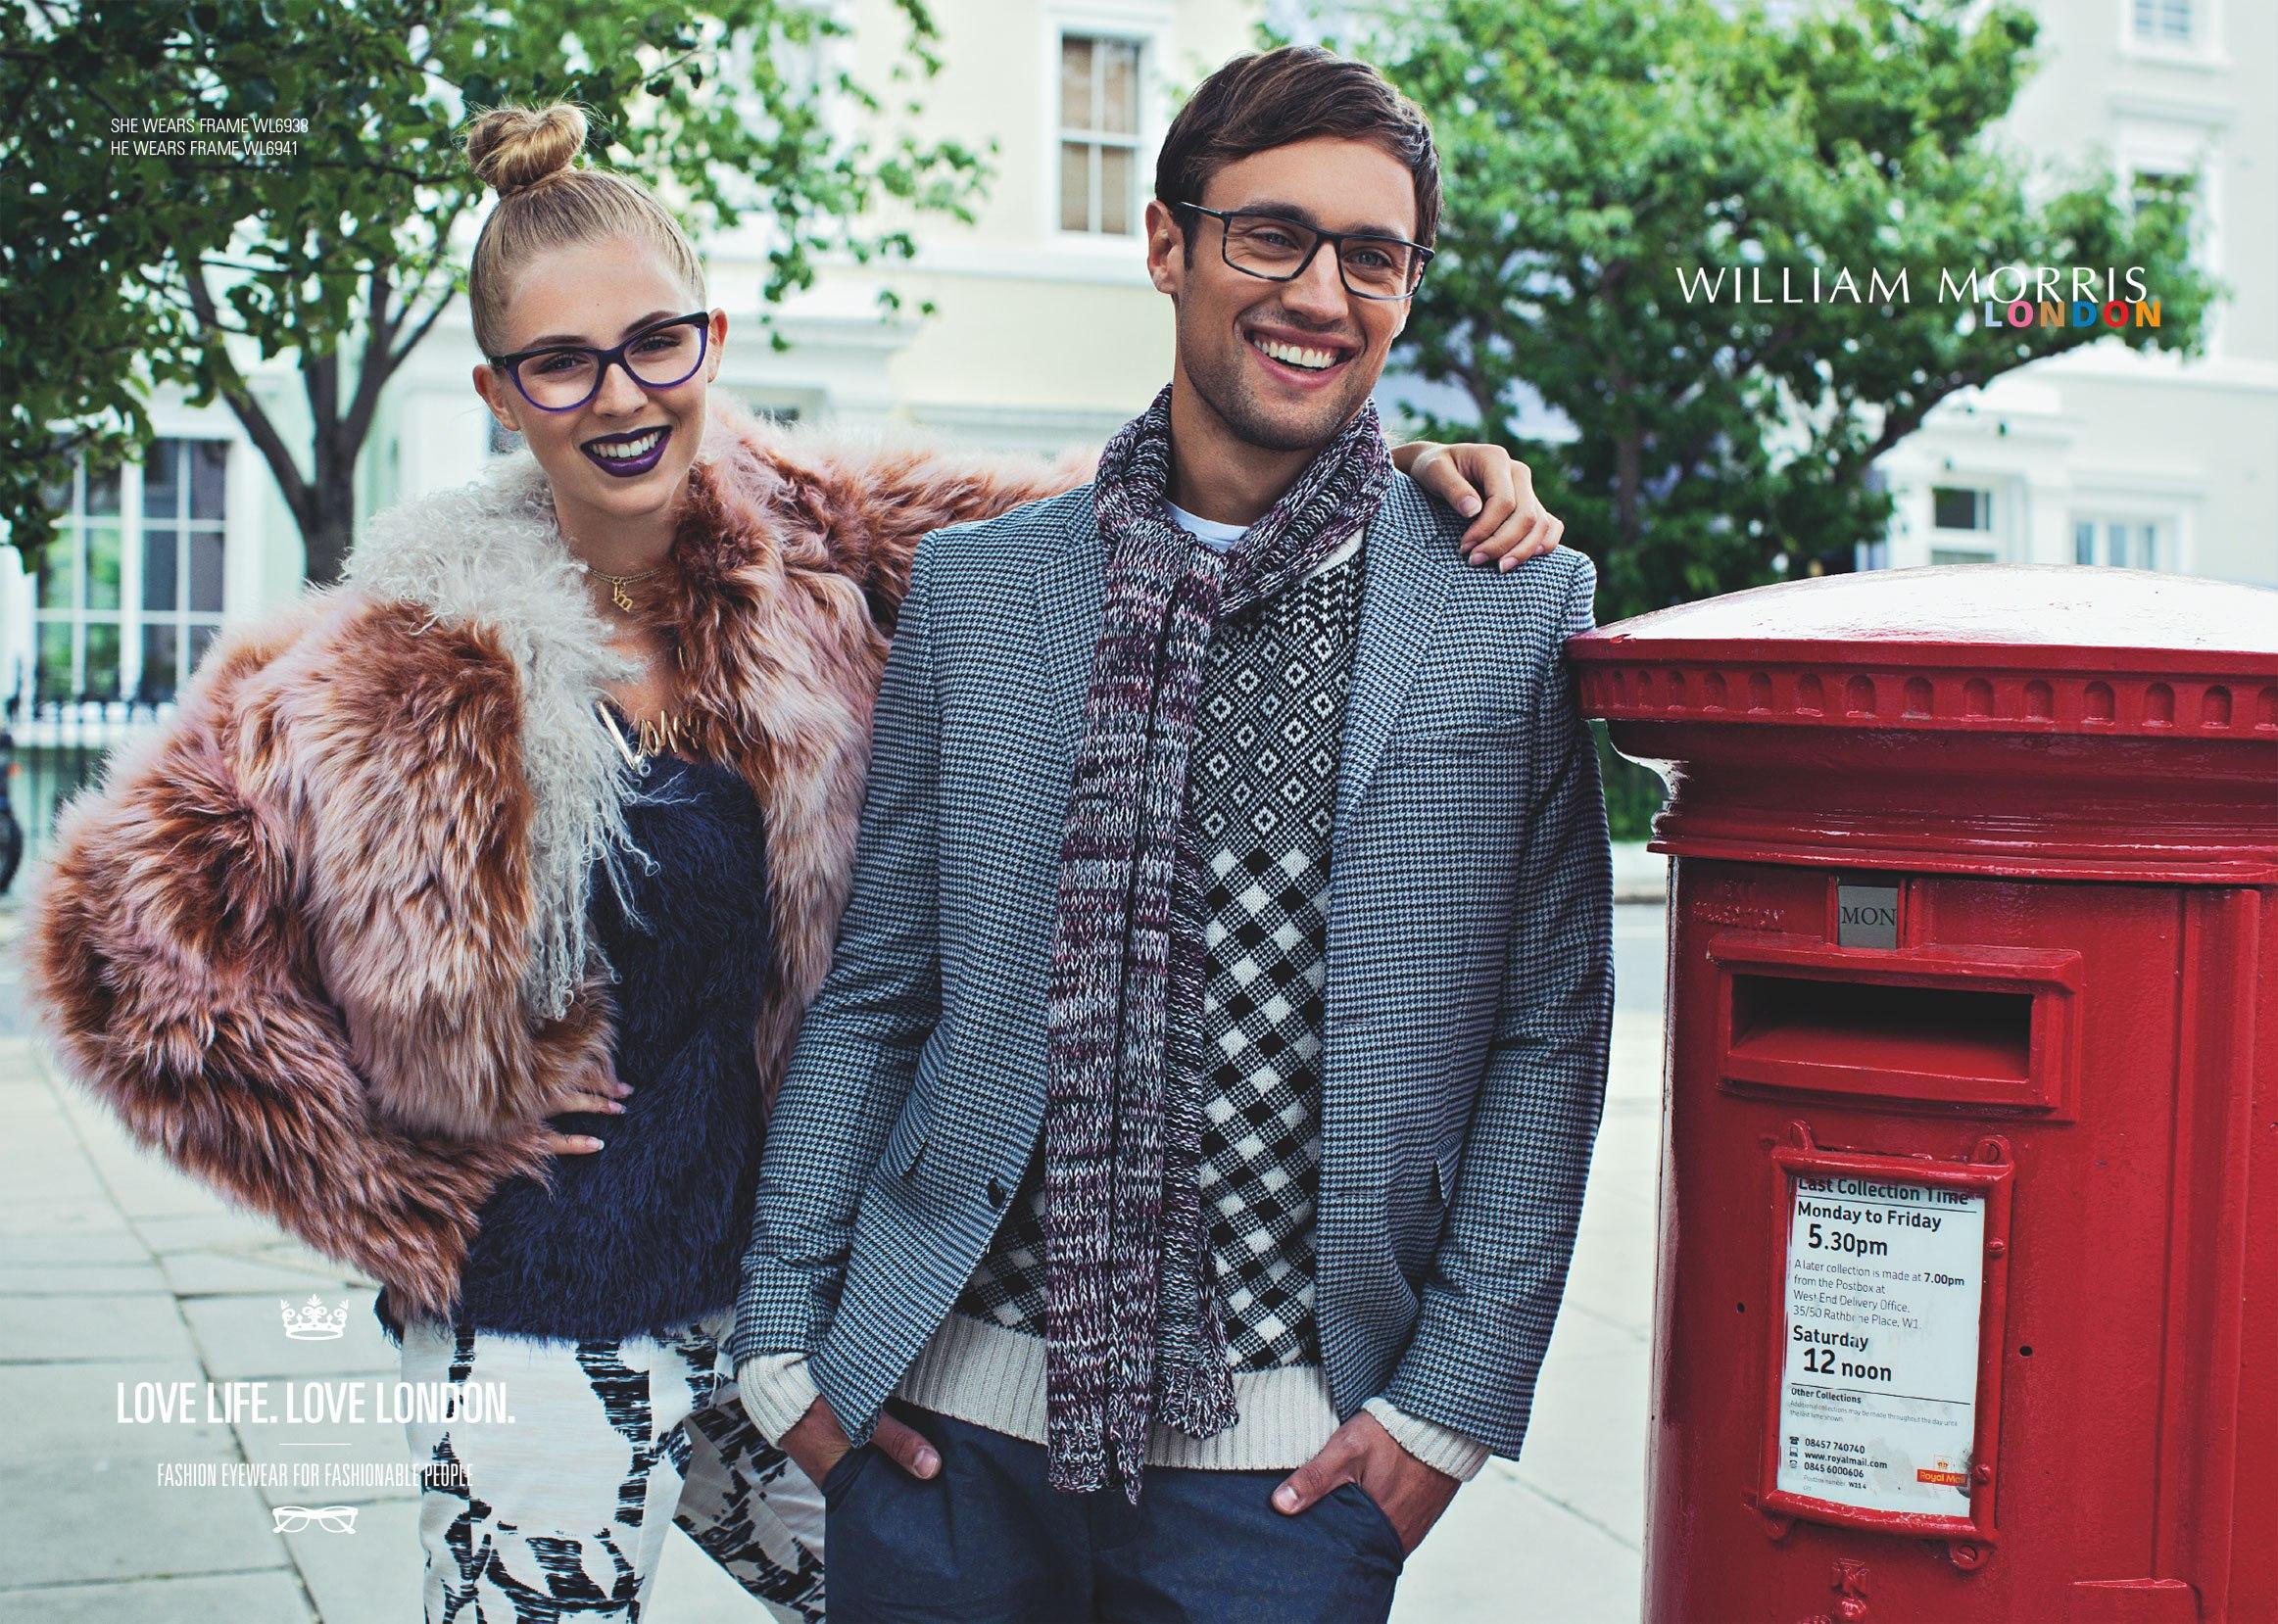 william-morris-london-2013-campaign-glasses-eyewear-1